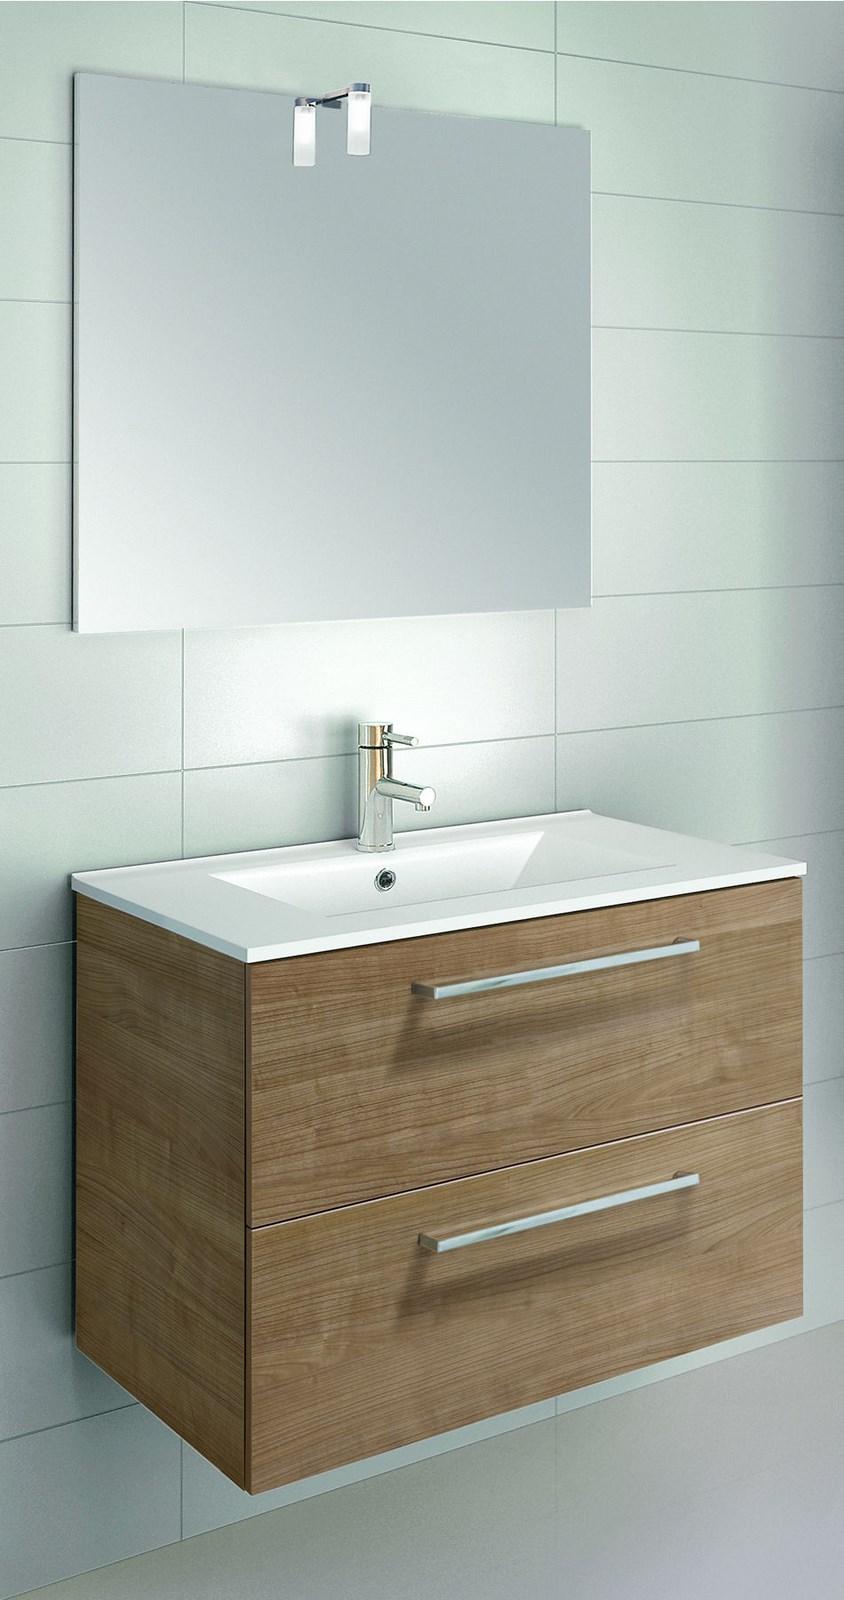 ensemble meuble saphir tiroirs royo. Black Bedroom Furniture Sets. Home Design Ideas